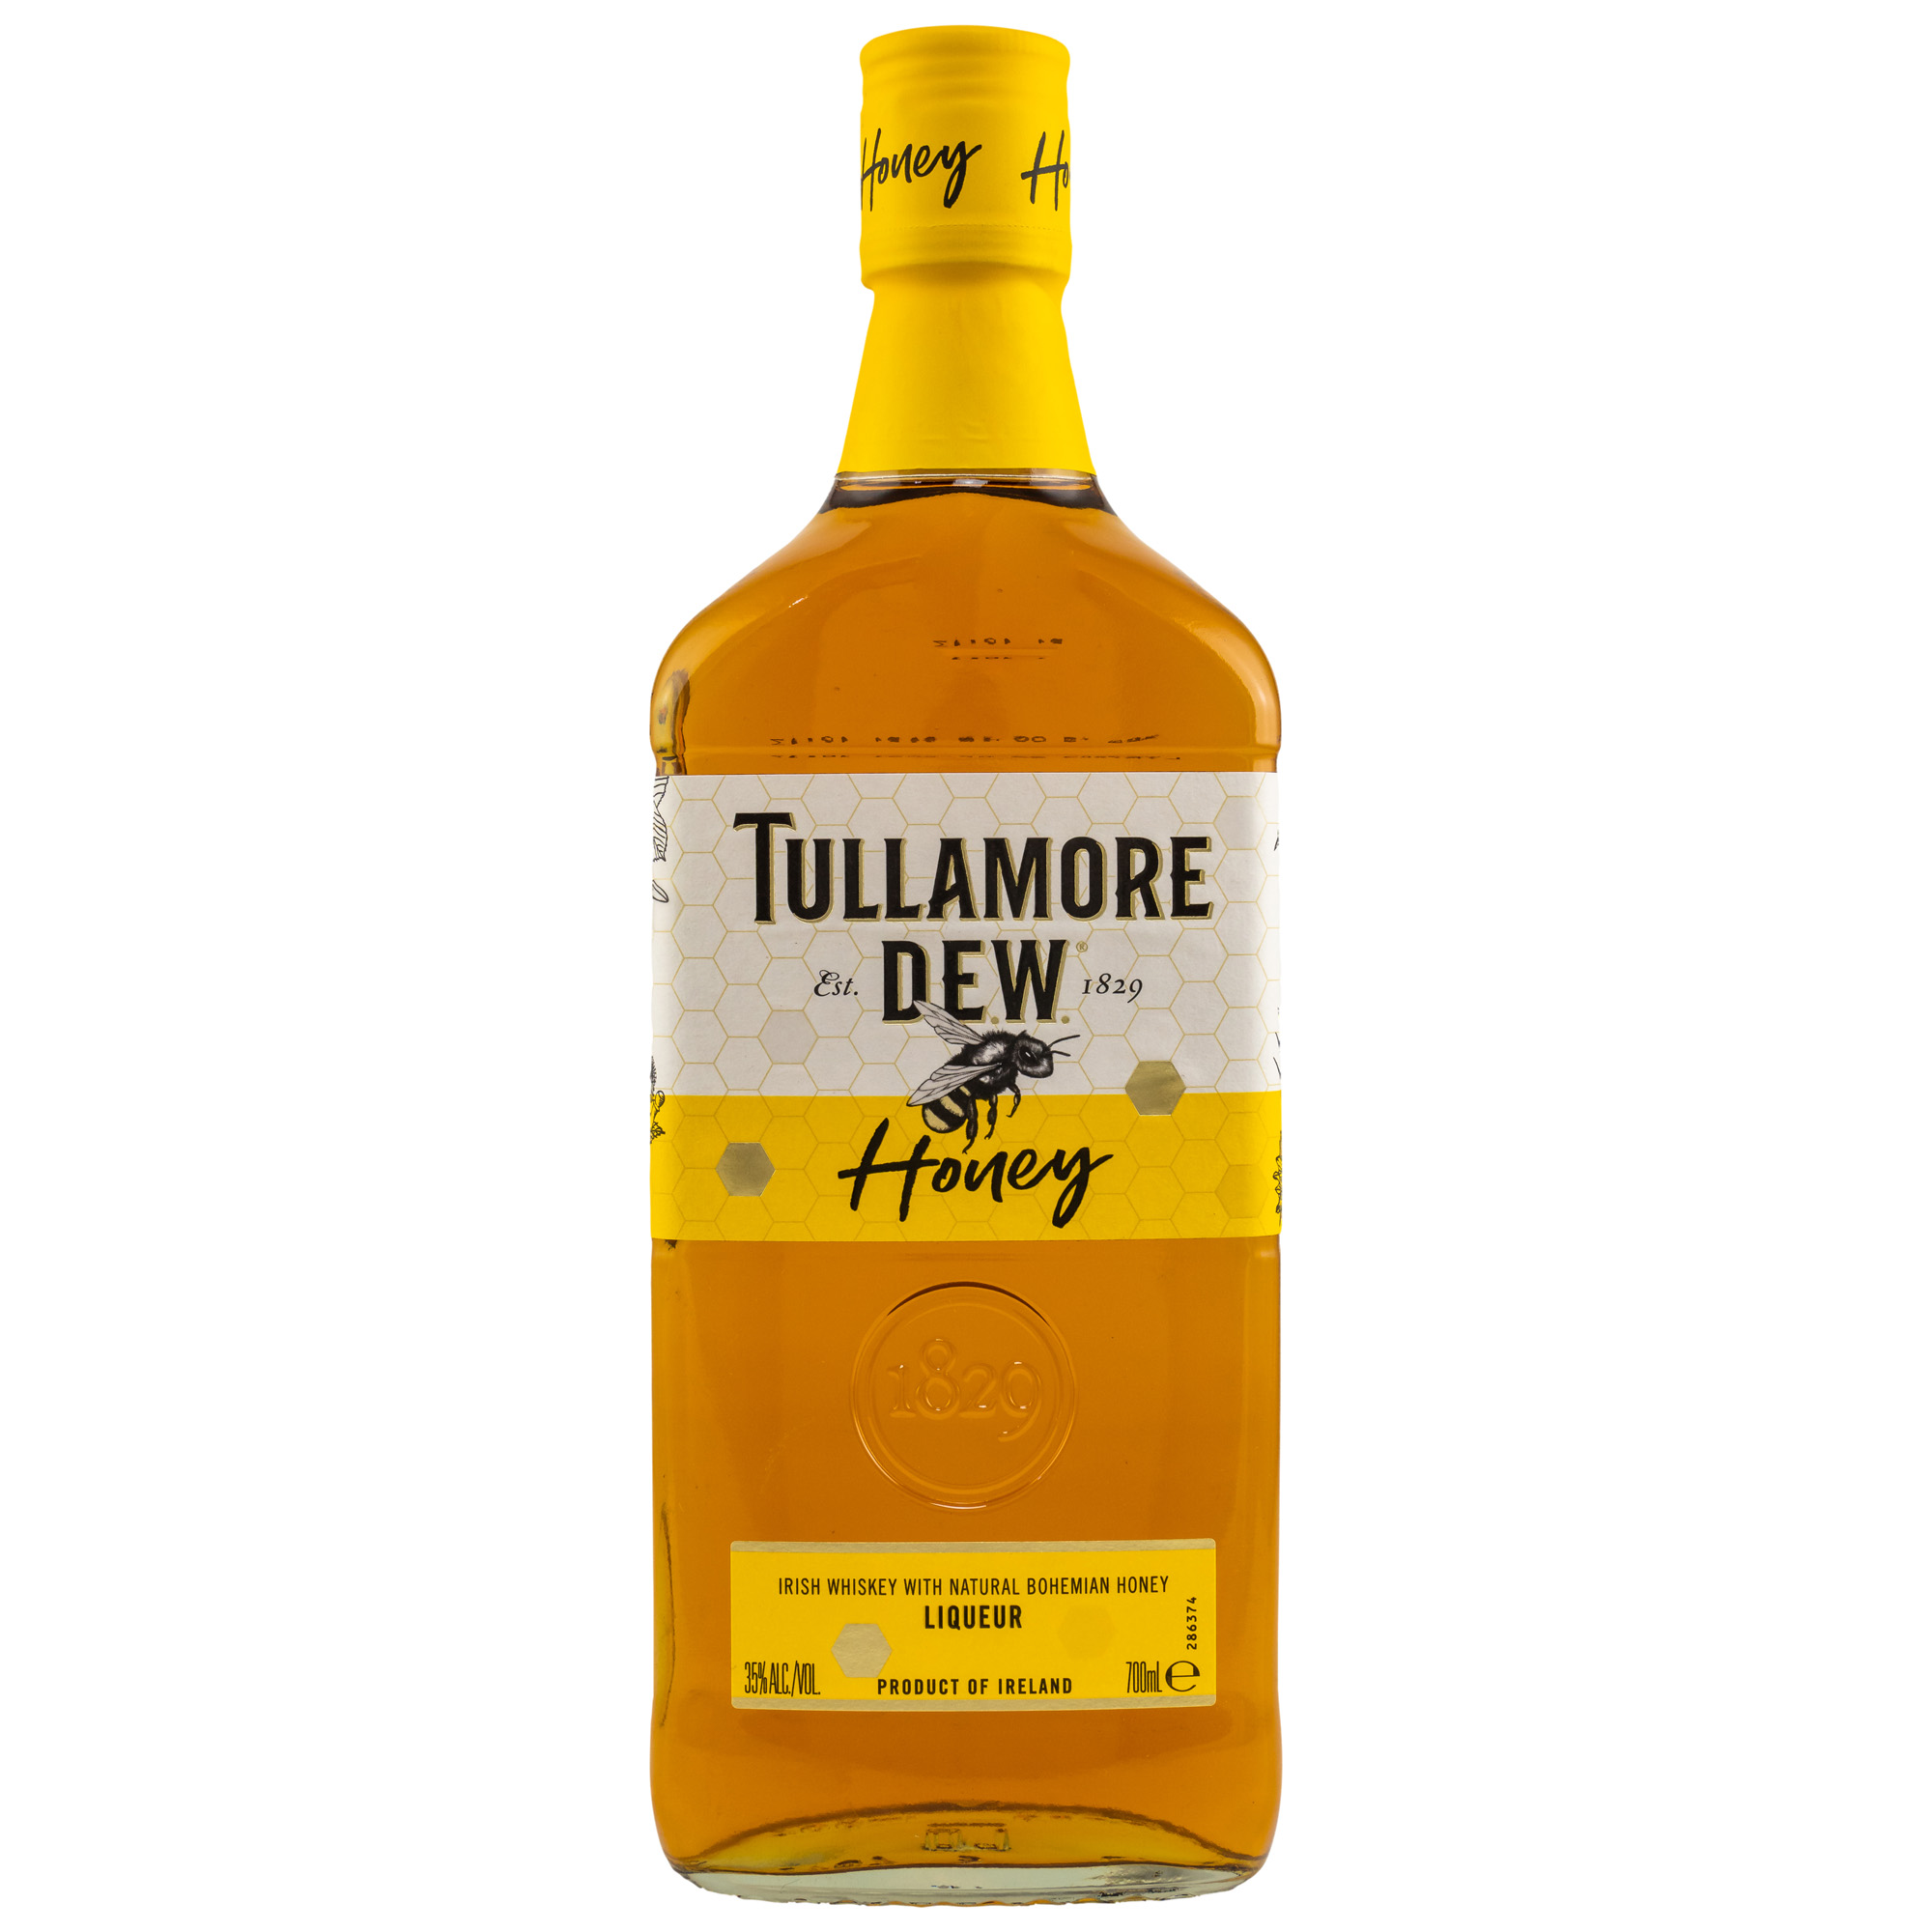 Tullamore Dew Honey 35%